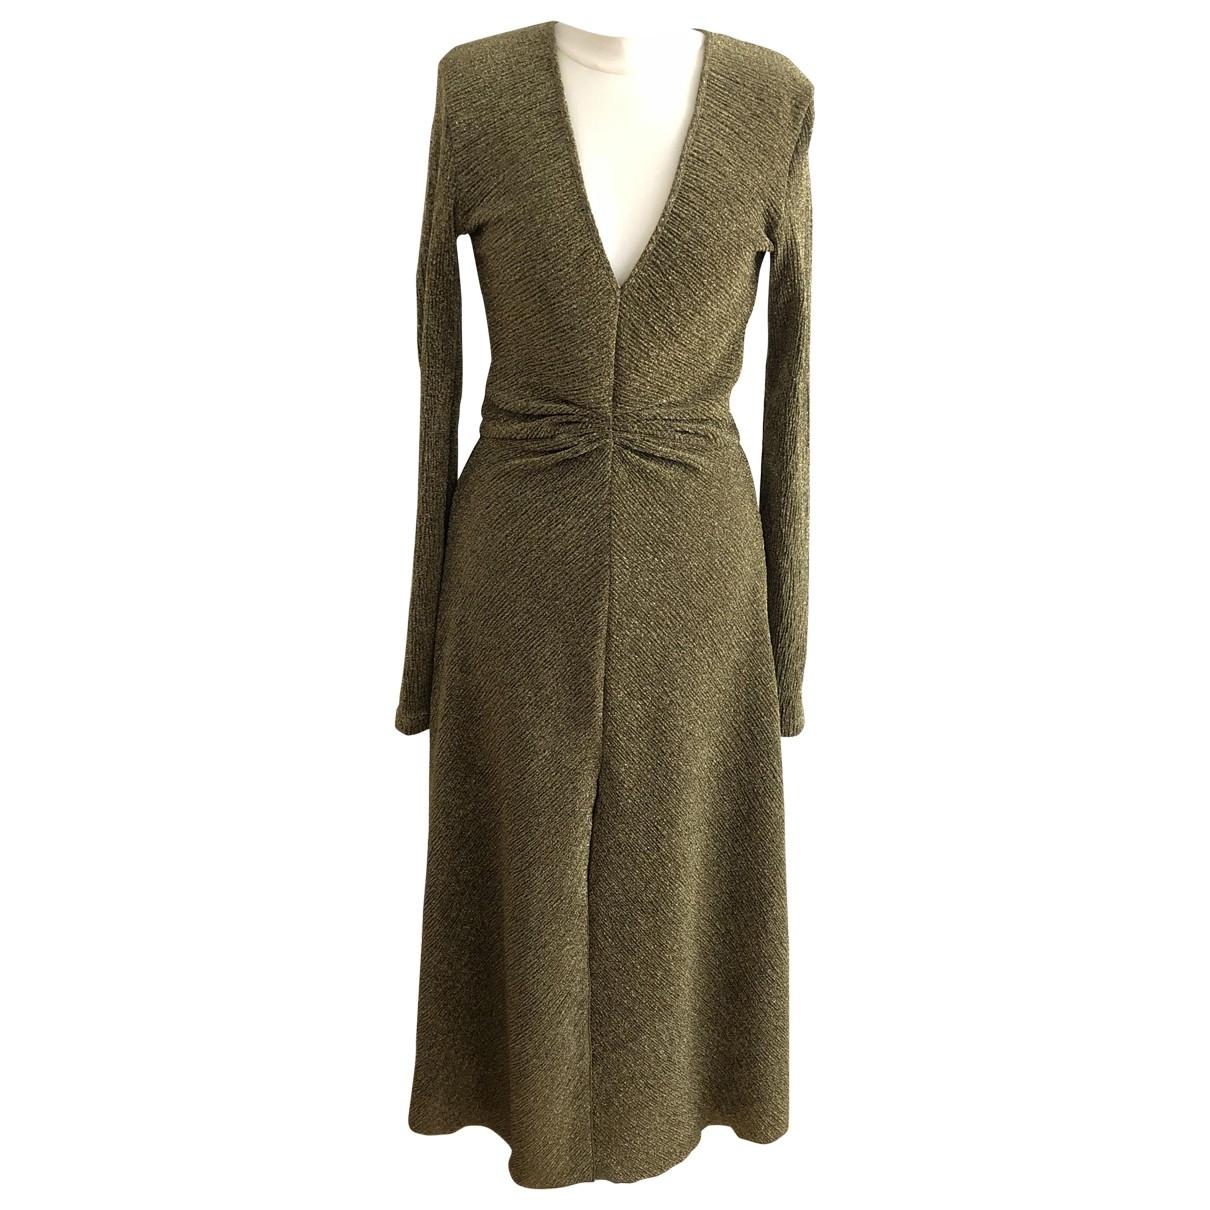 Rotate \N Khaki dress for Women S International